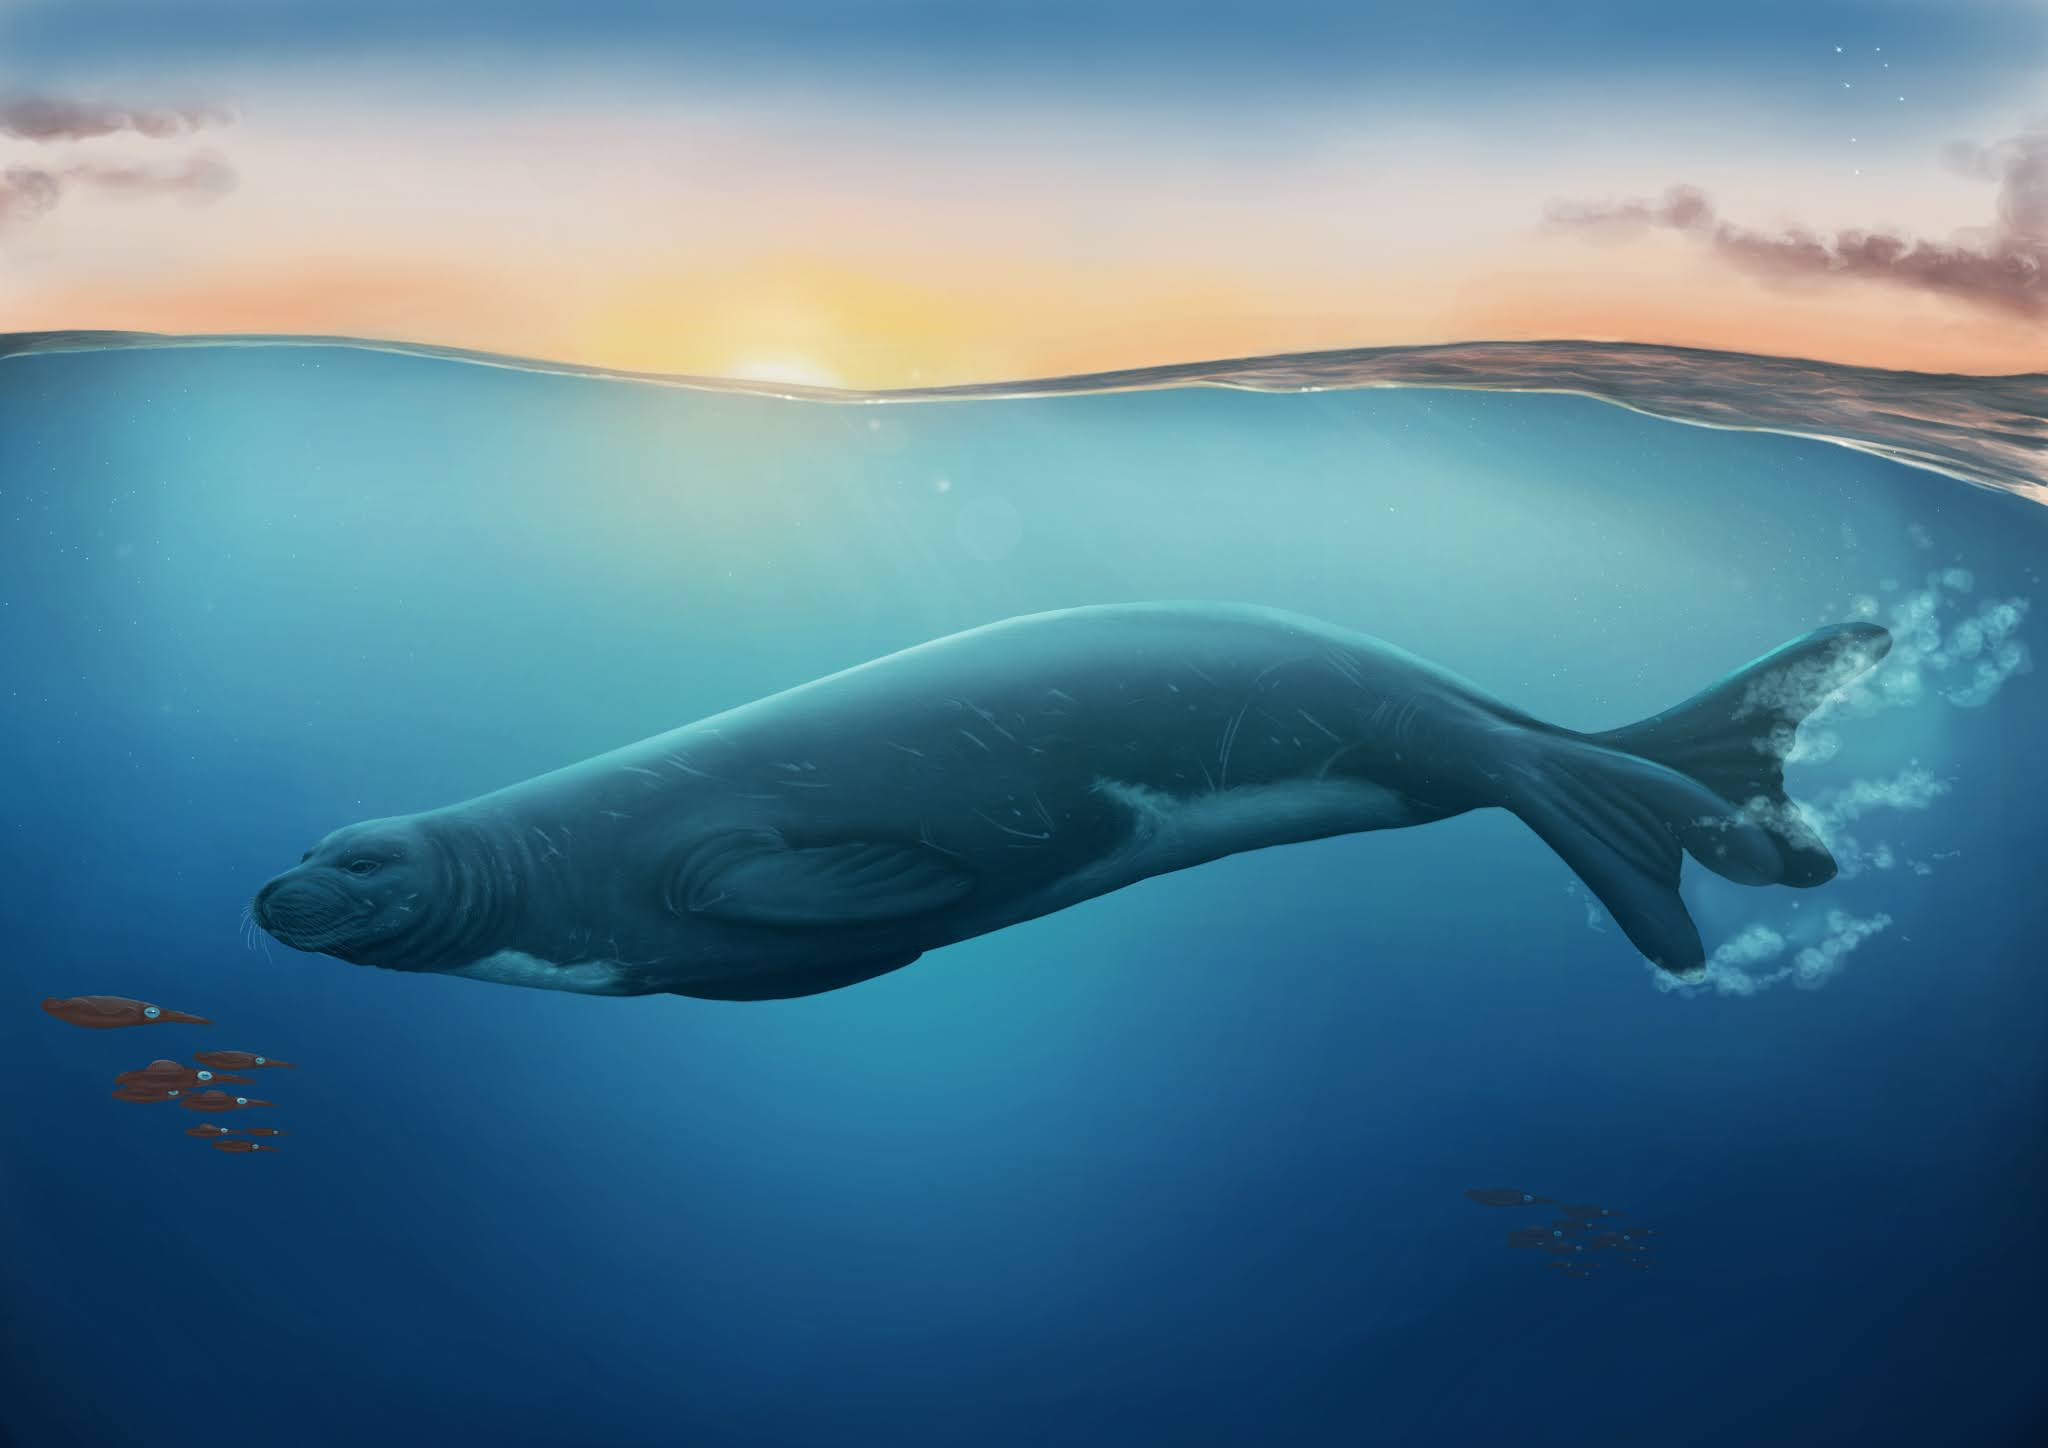 Eomonachus_belegaerensis-novataxa_2020-R